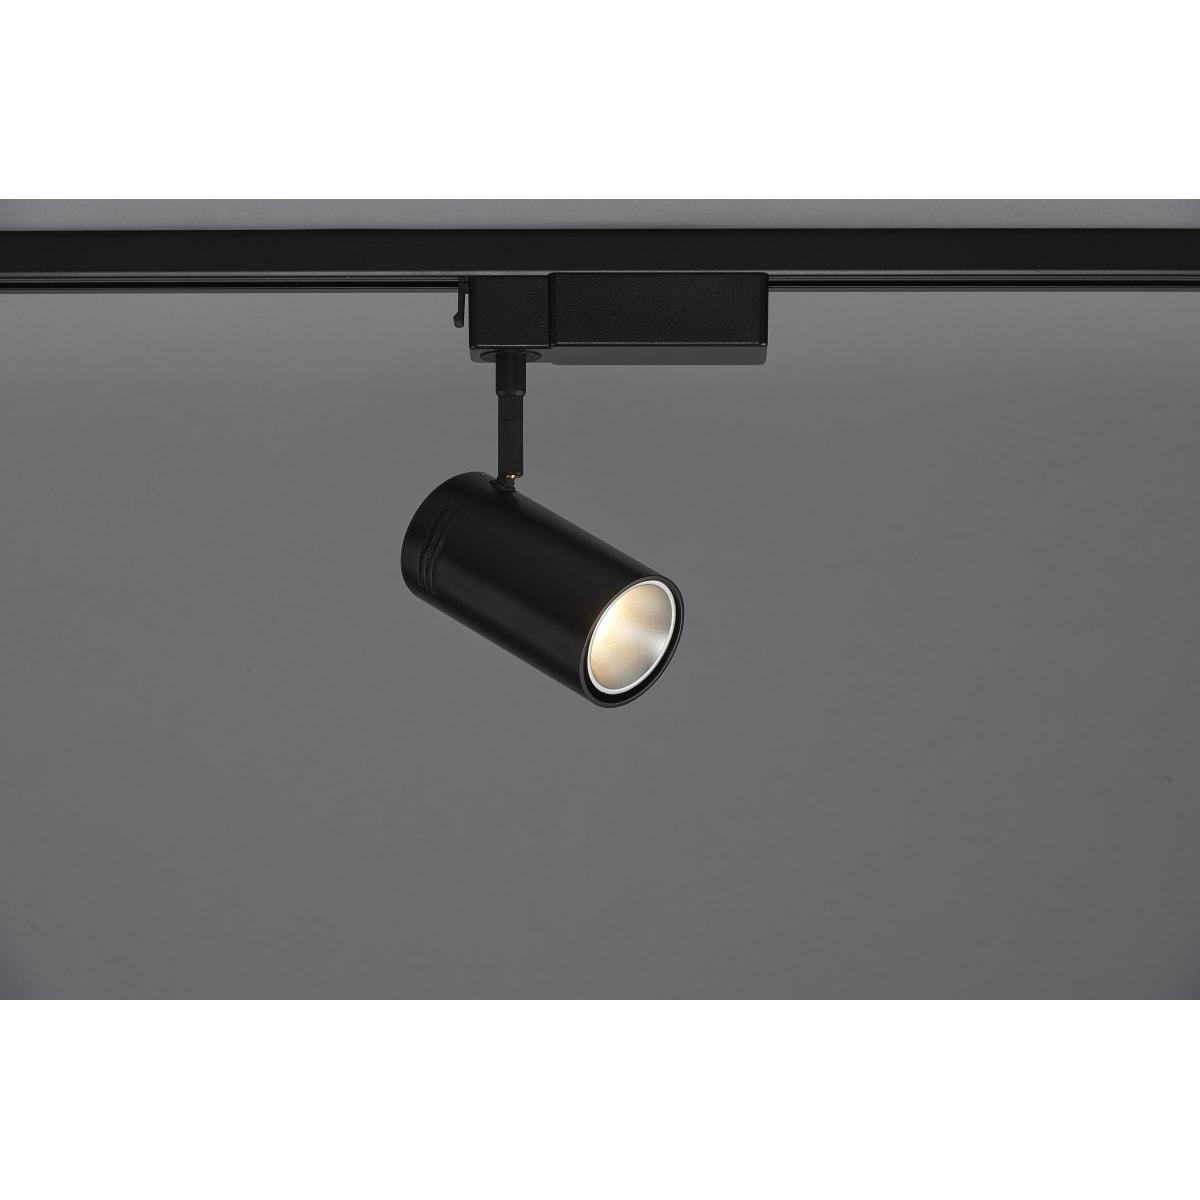 Bruck Lighting 350409 27k Eco